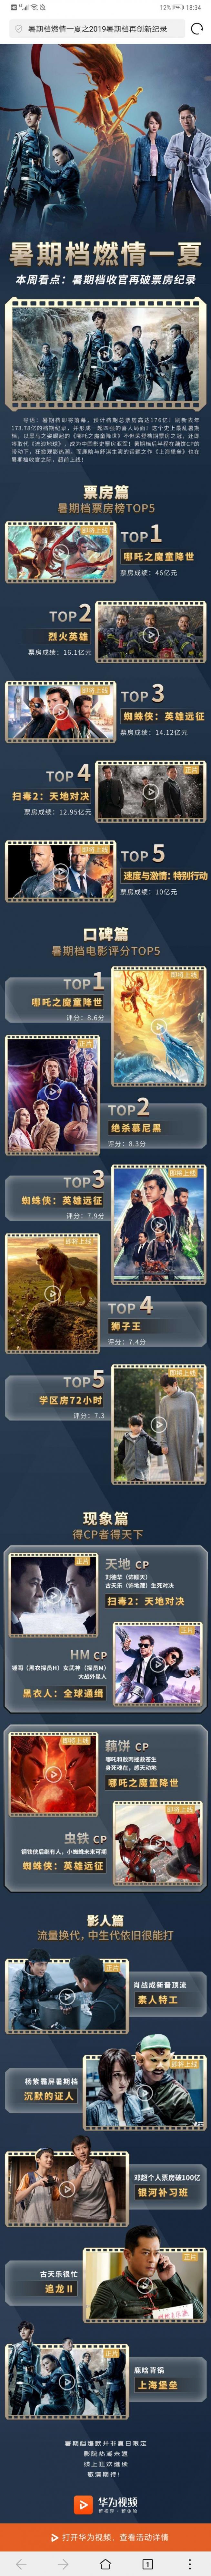 Screenshot_20190830_183442_com.huawei.browser.jpg